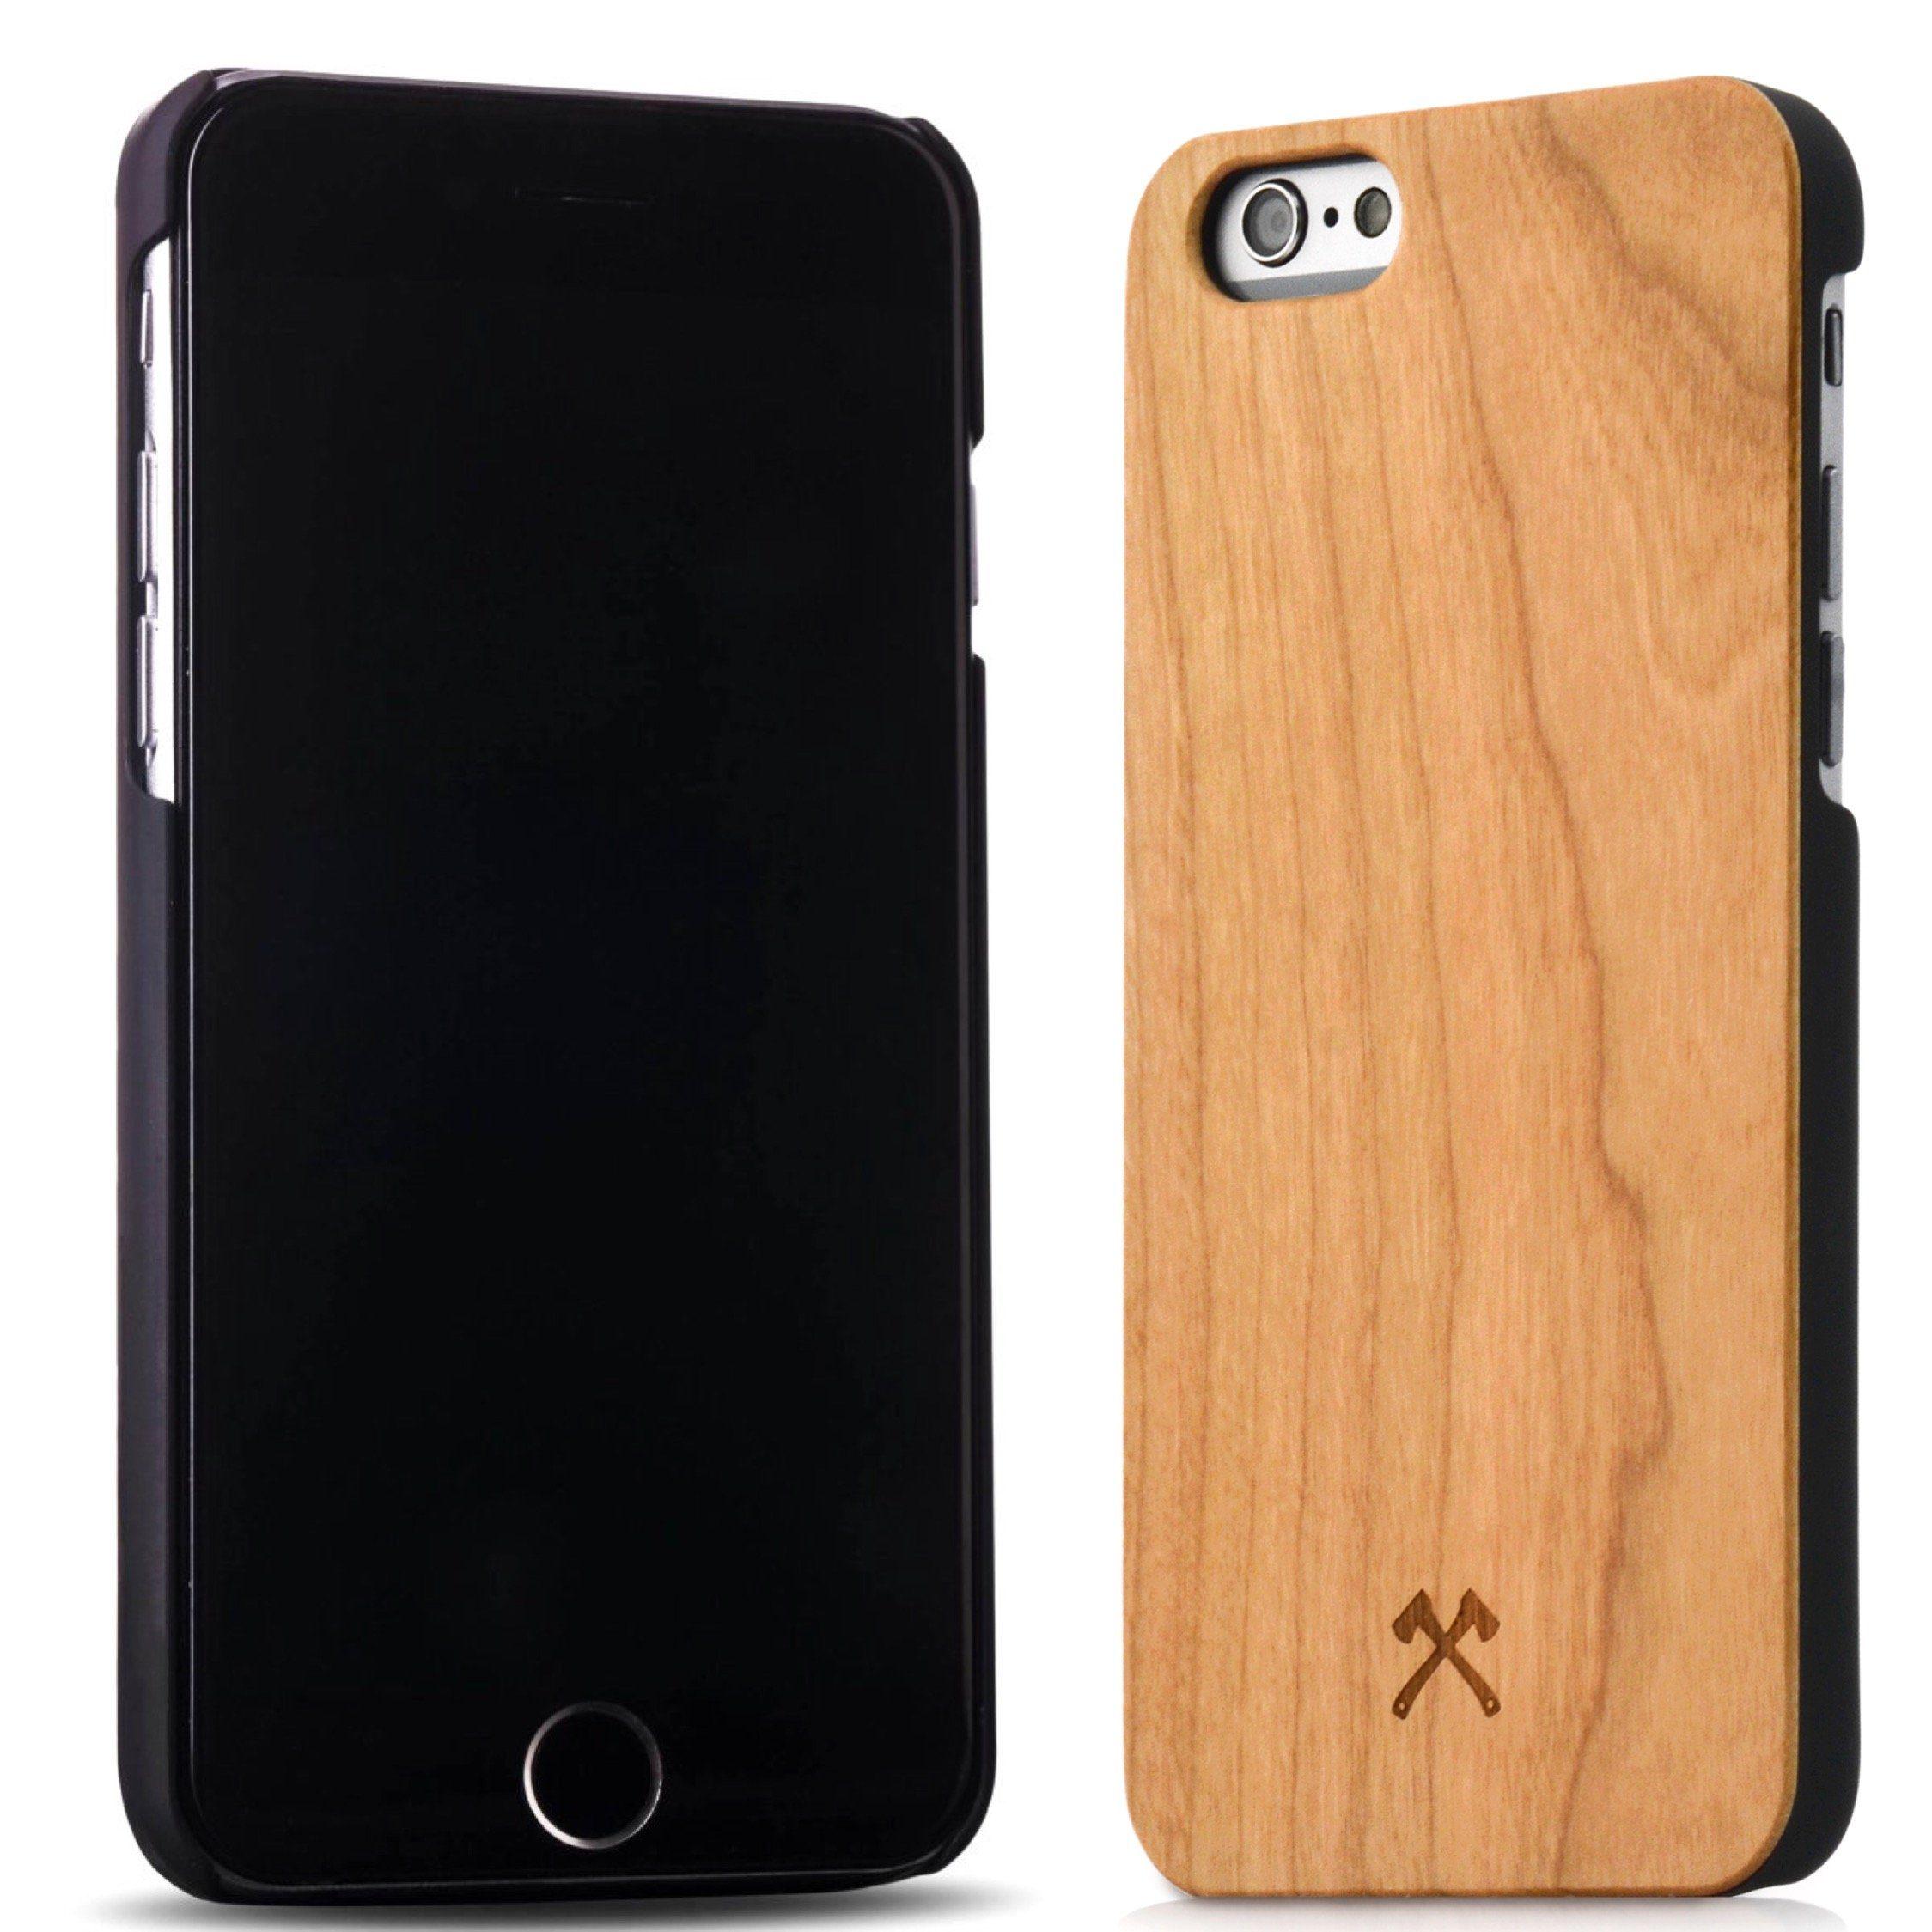 Woodcessories EcoCase iPhone 6 / 6s Echtholz Classic Case